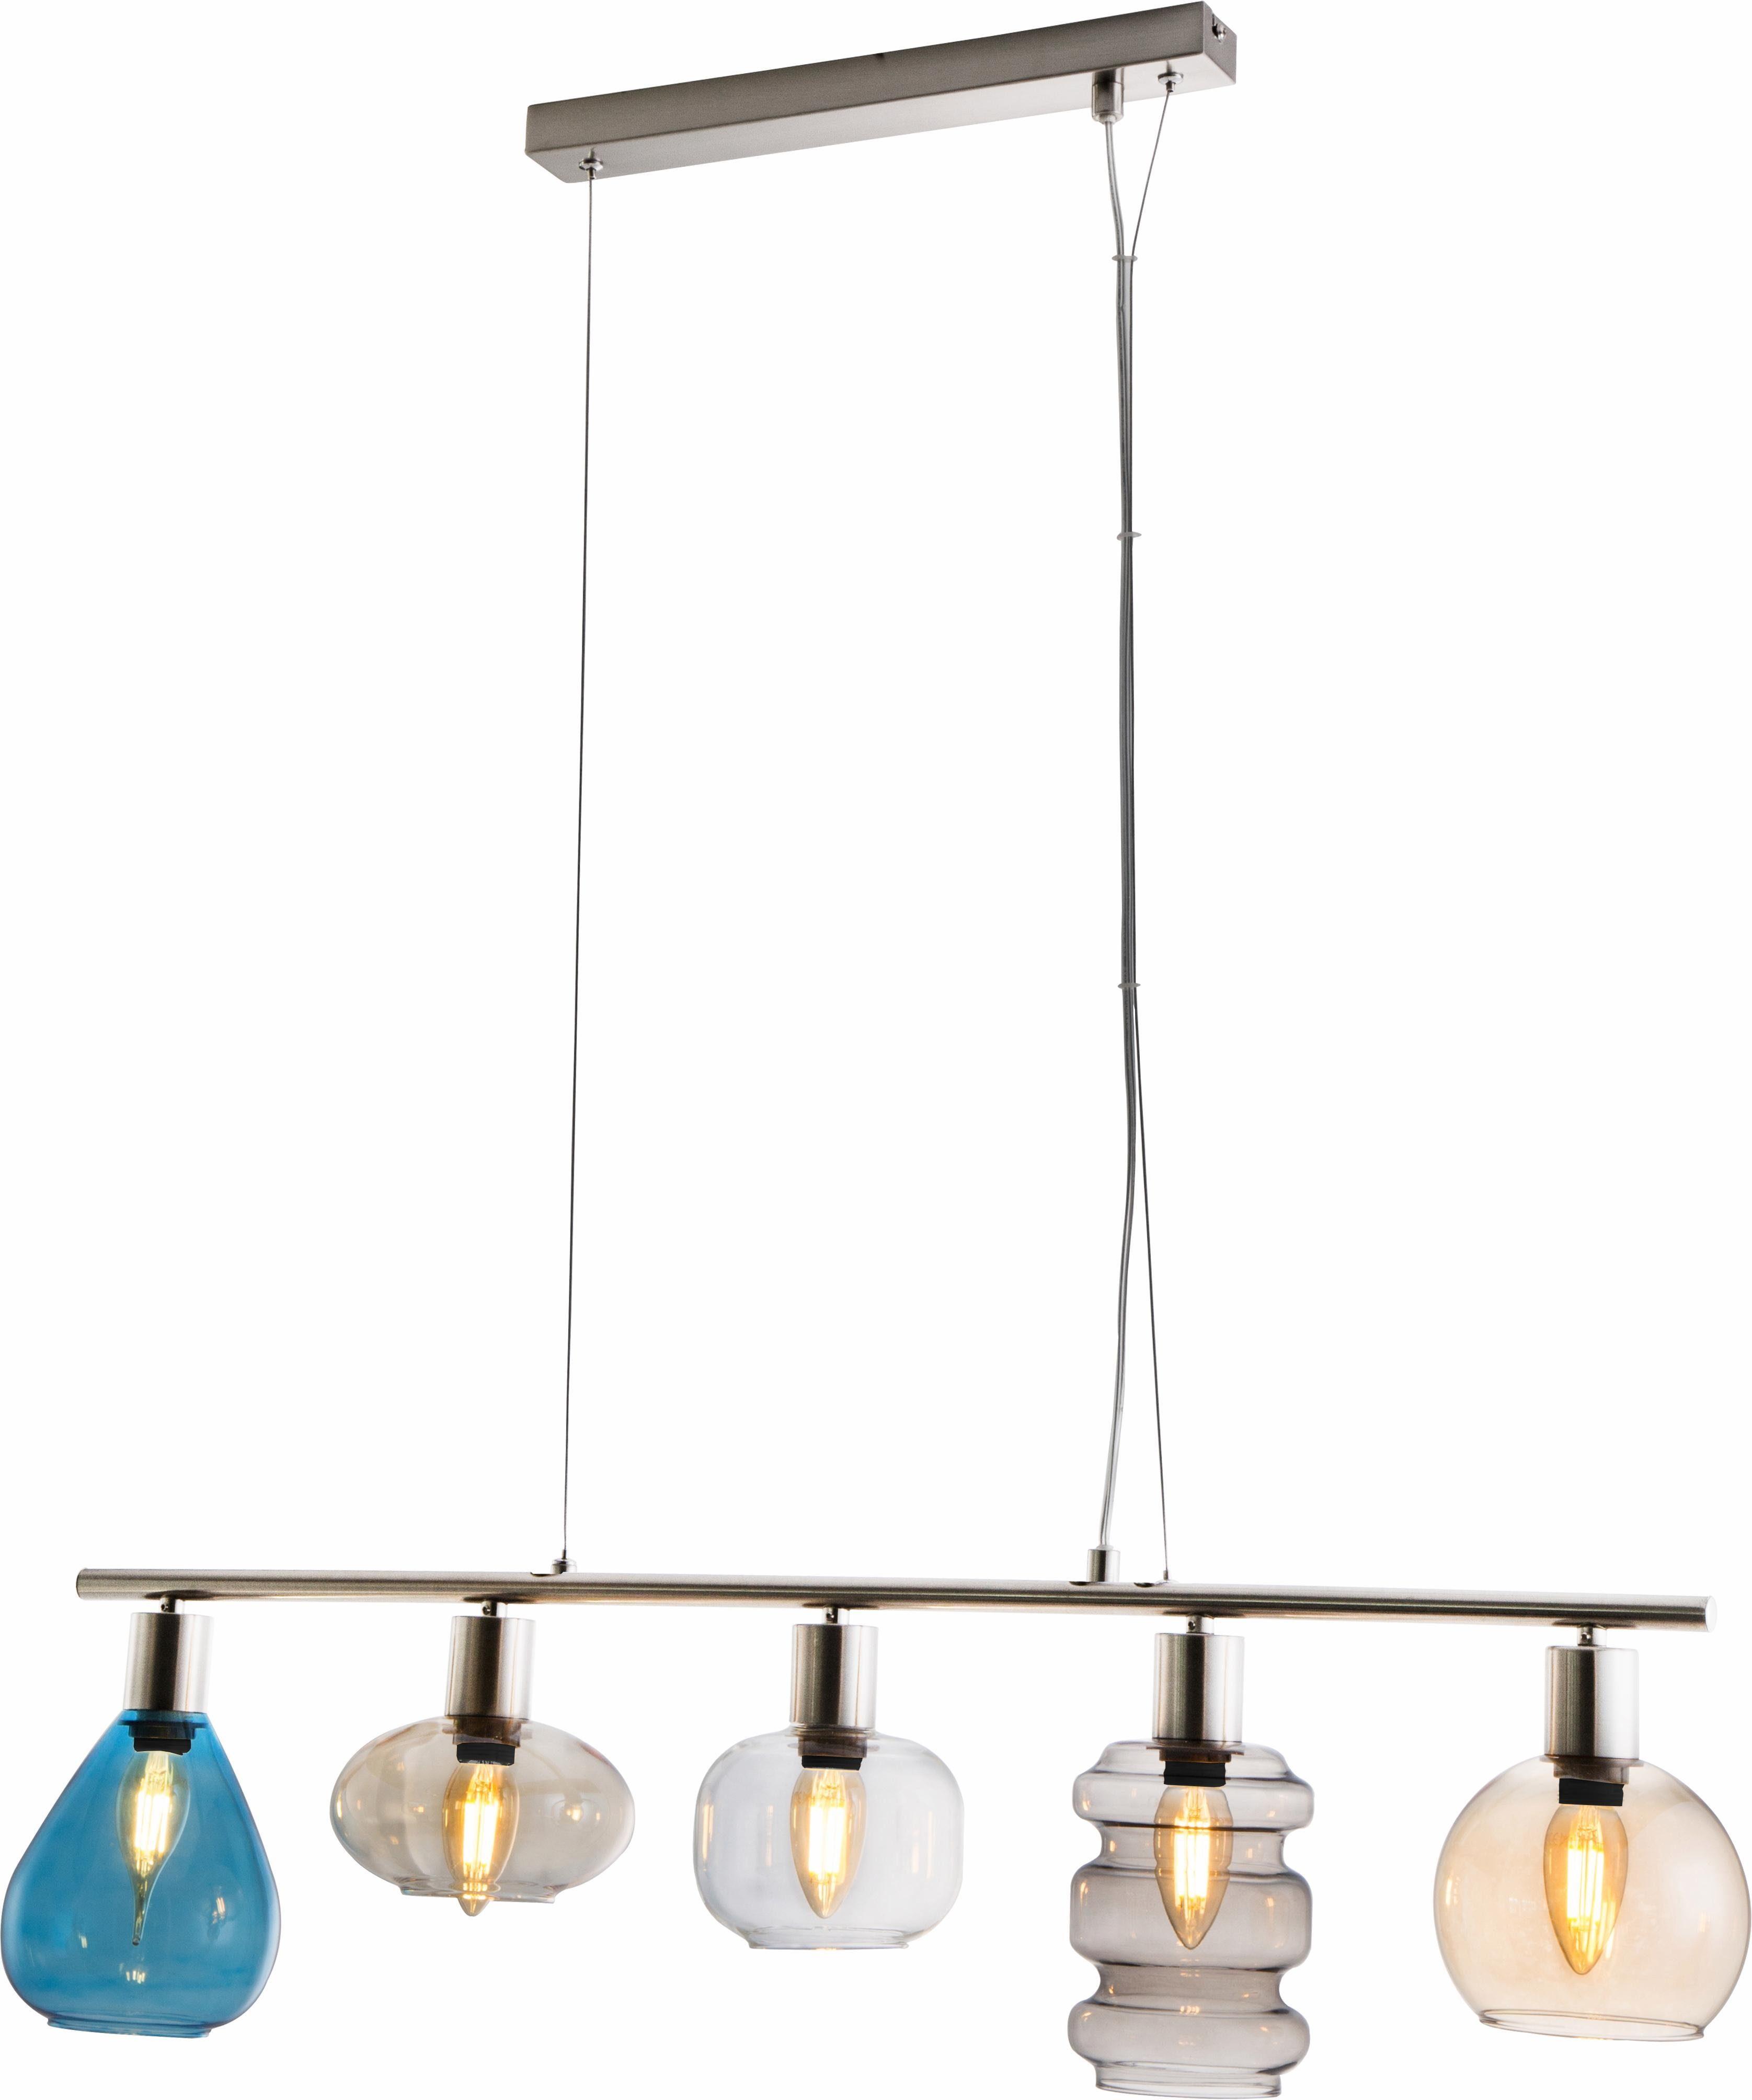 Nino Leuchten Pendelleuchte »PESARO«, 5-flammig